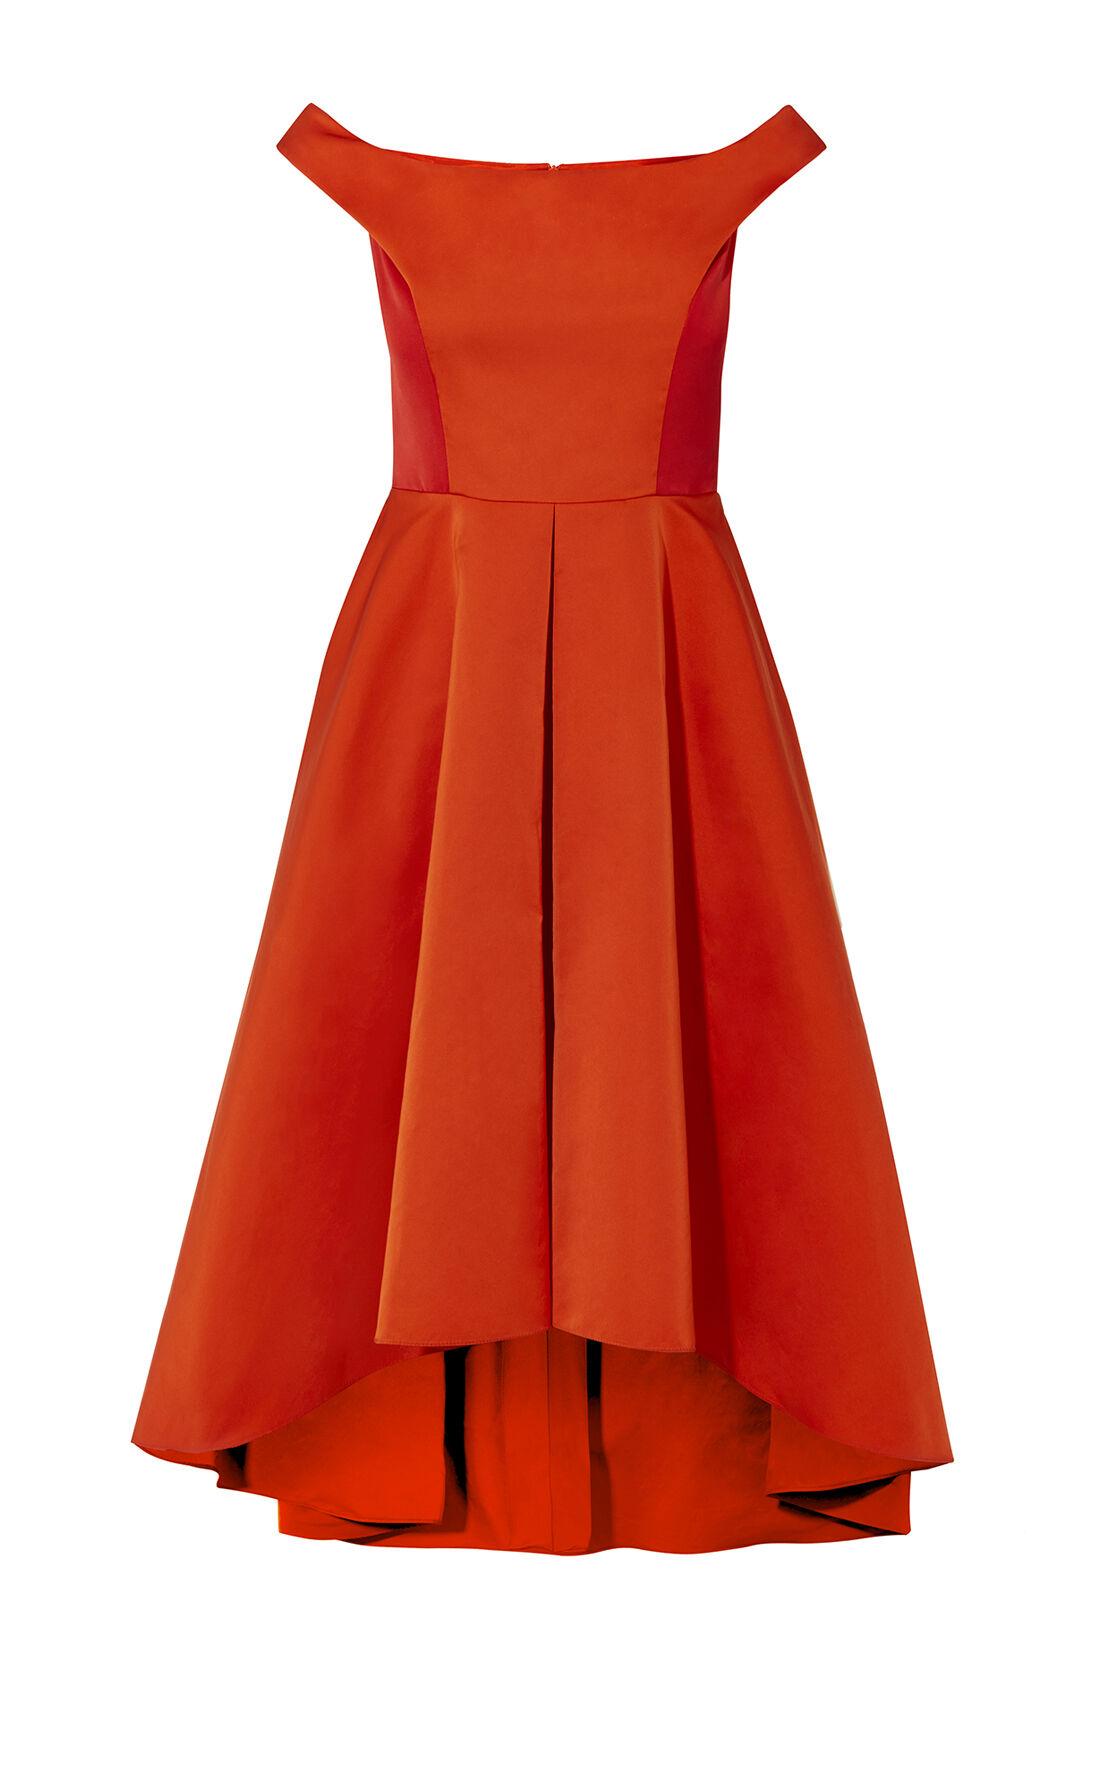 Karen Millen, OFF-THE-SHOULDER PROM DRESS Red 0